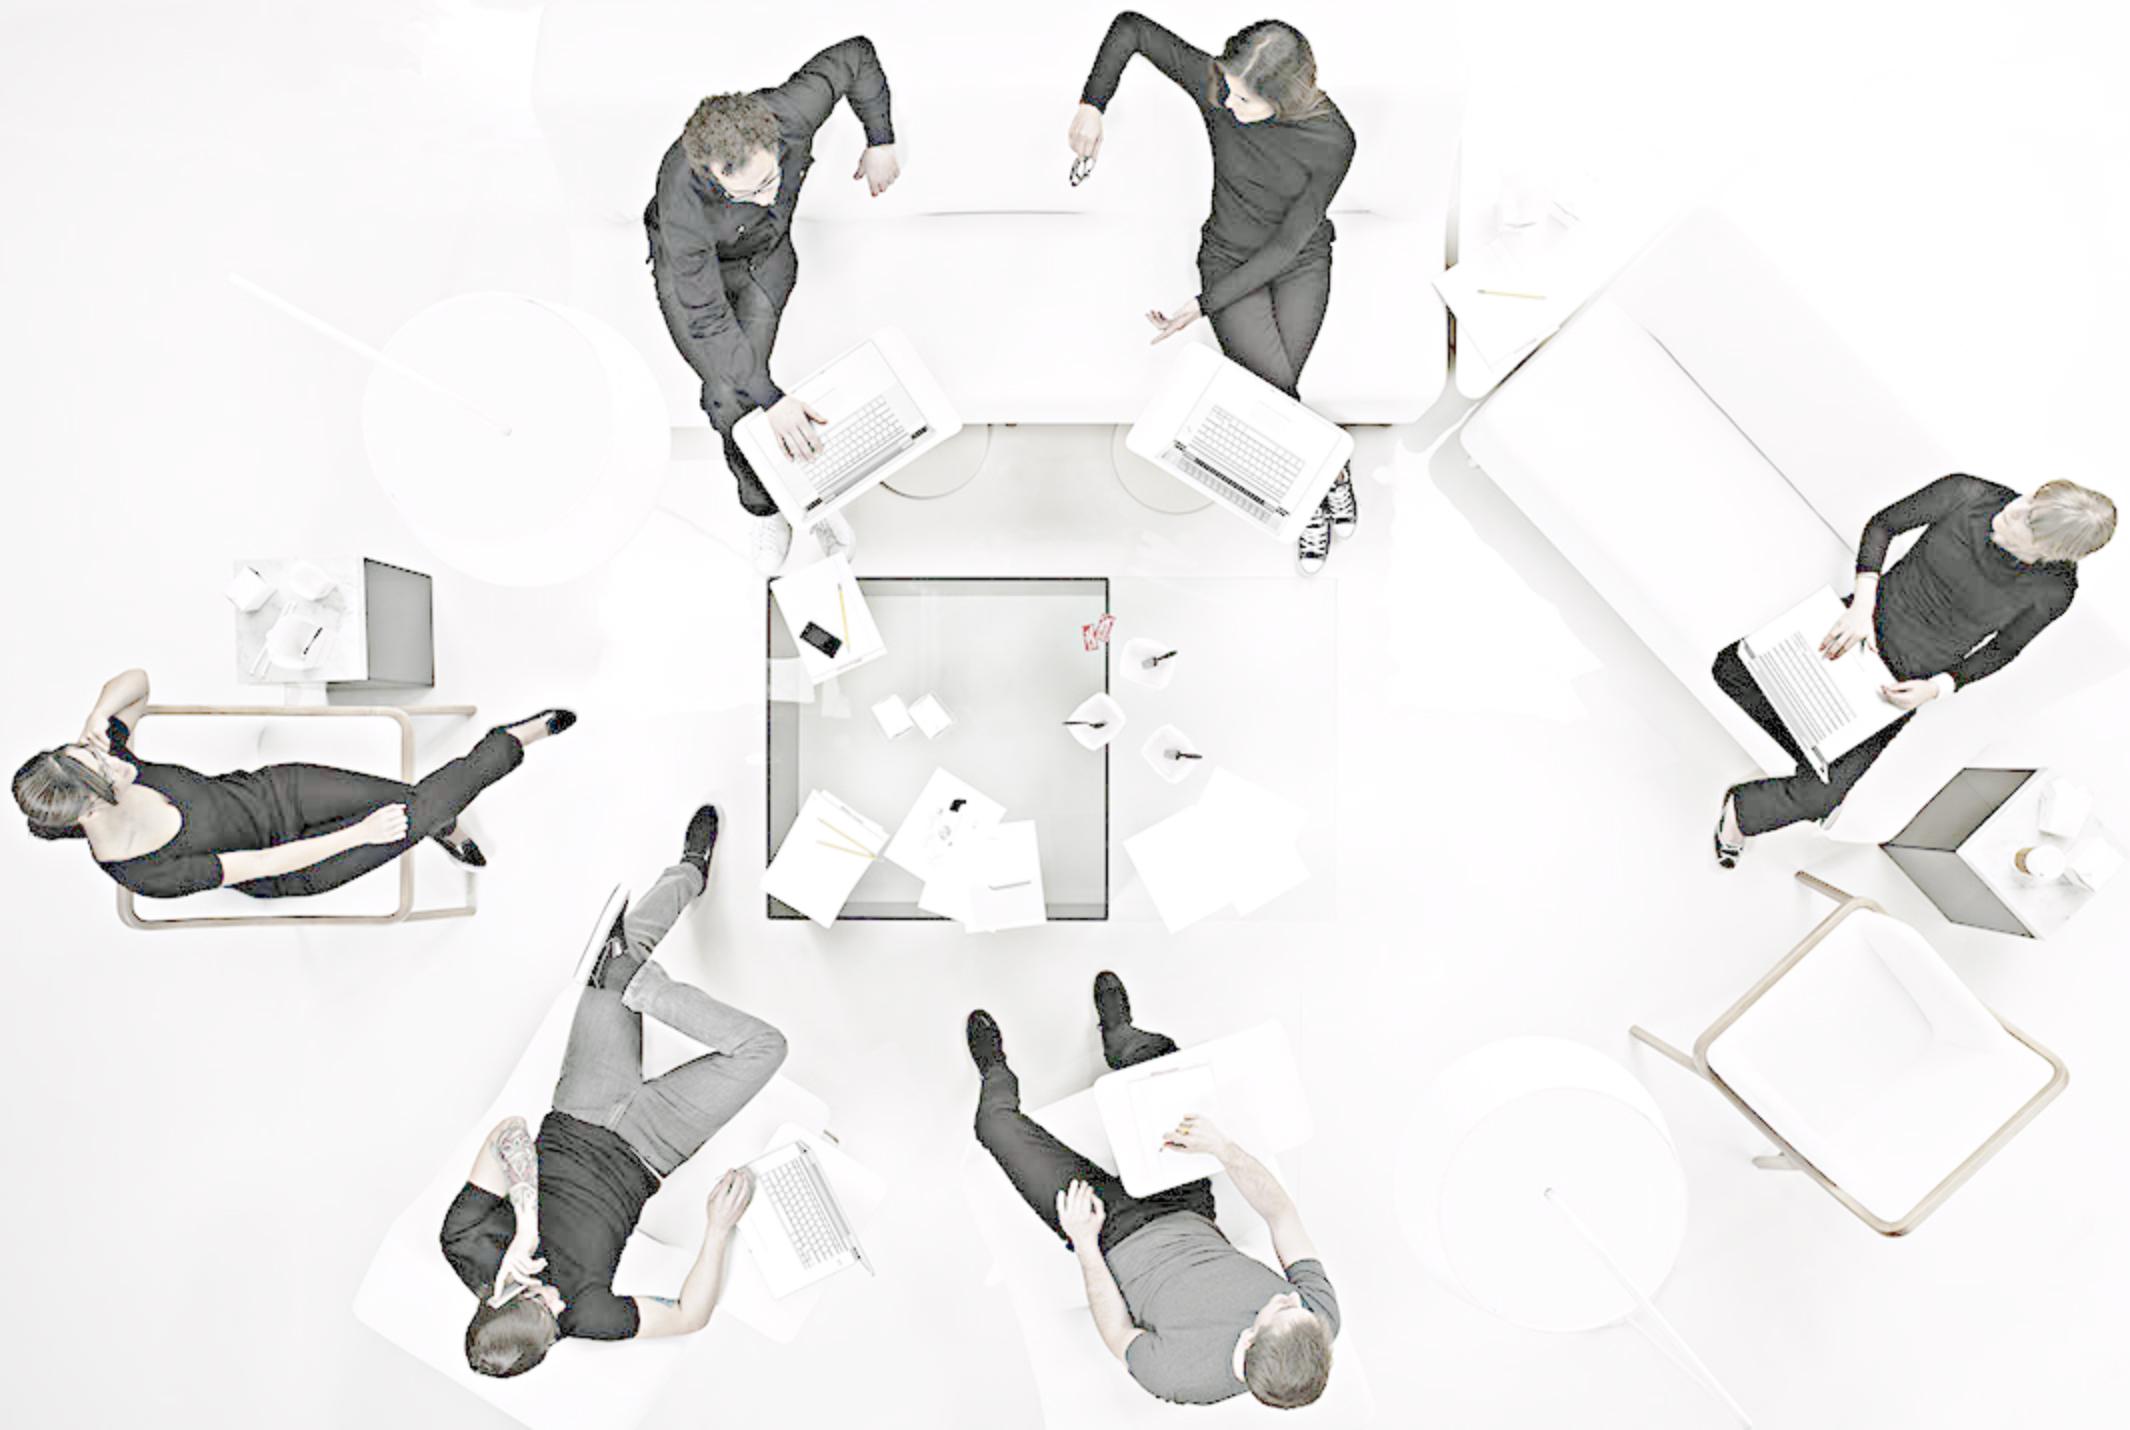 WO_Overhead Office